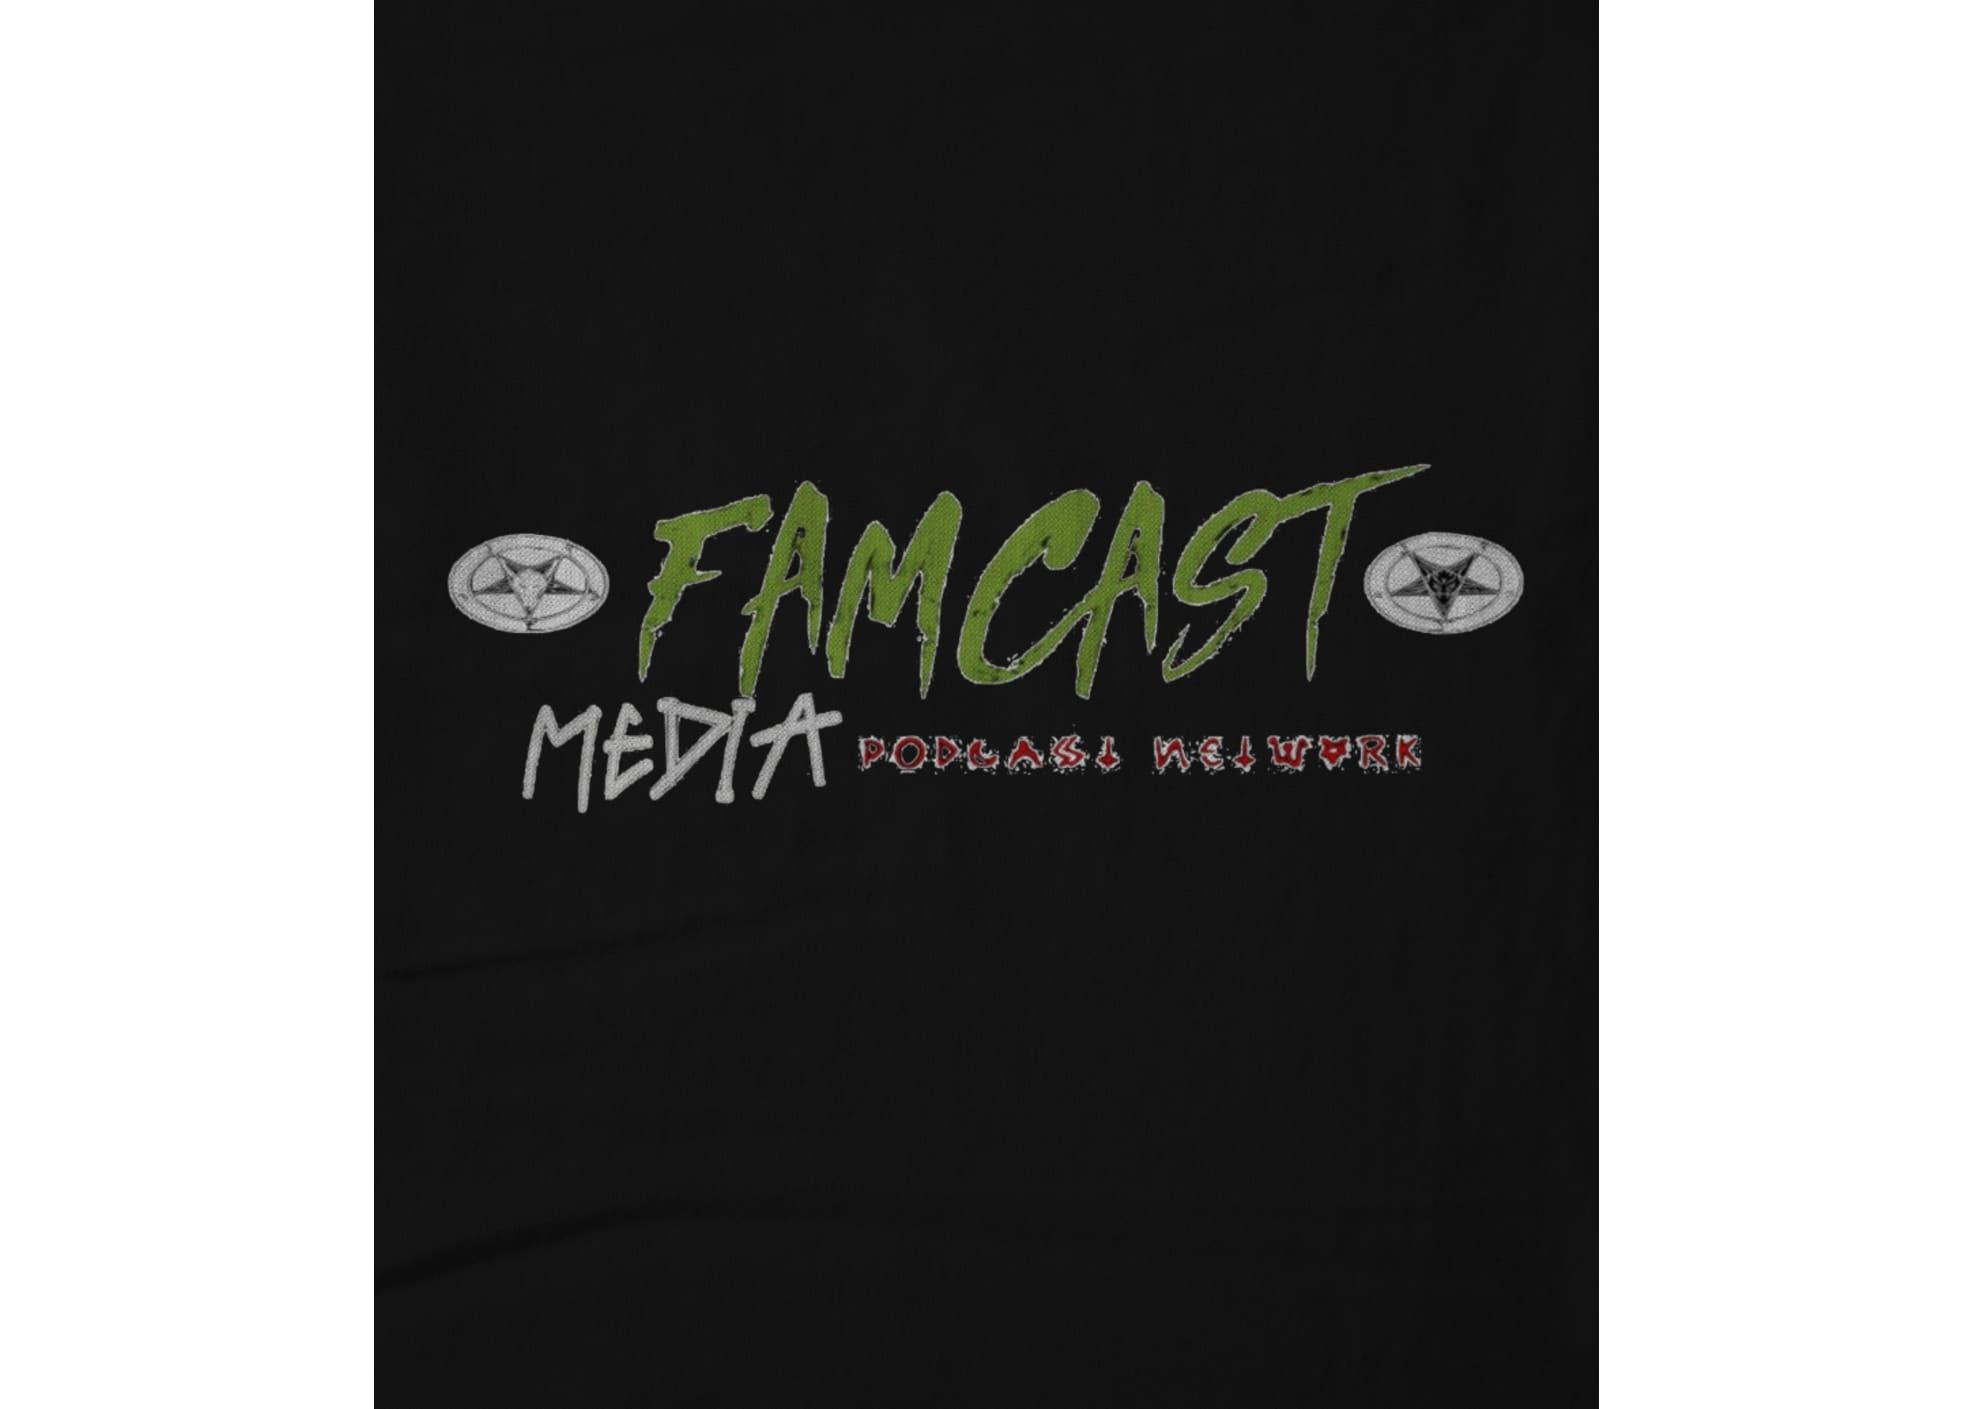 Famcast media podcast network logo 2 1603825039